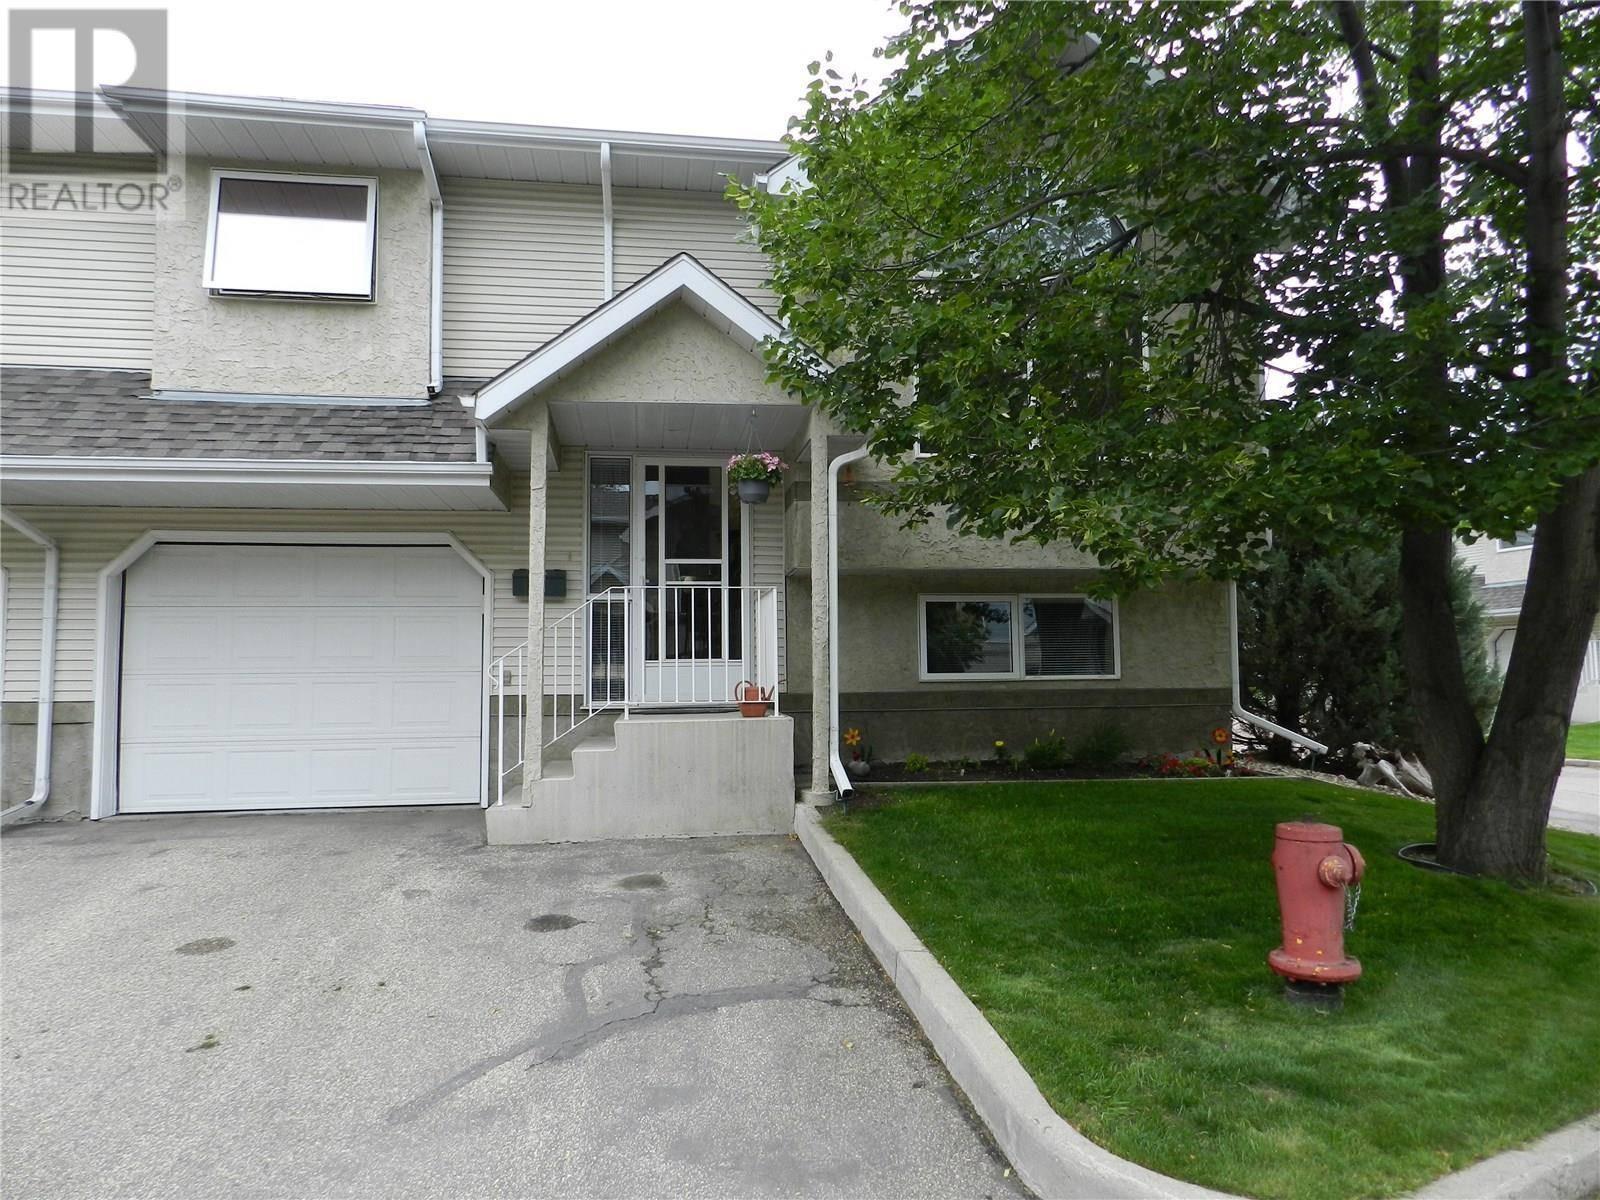 Townhouse for sale at 644 Heritage Ln Unit 10 Saskatoon Saskatchewan - MLS: SK778682